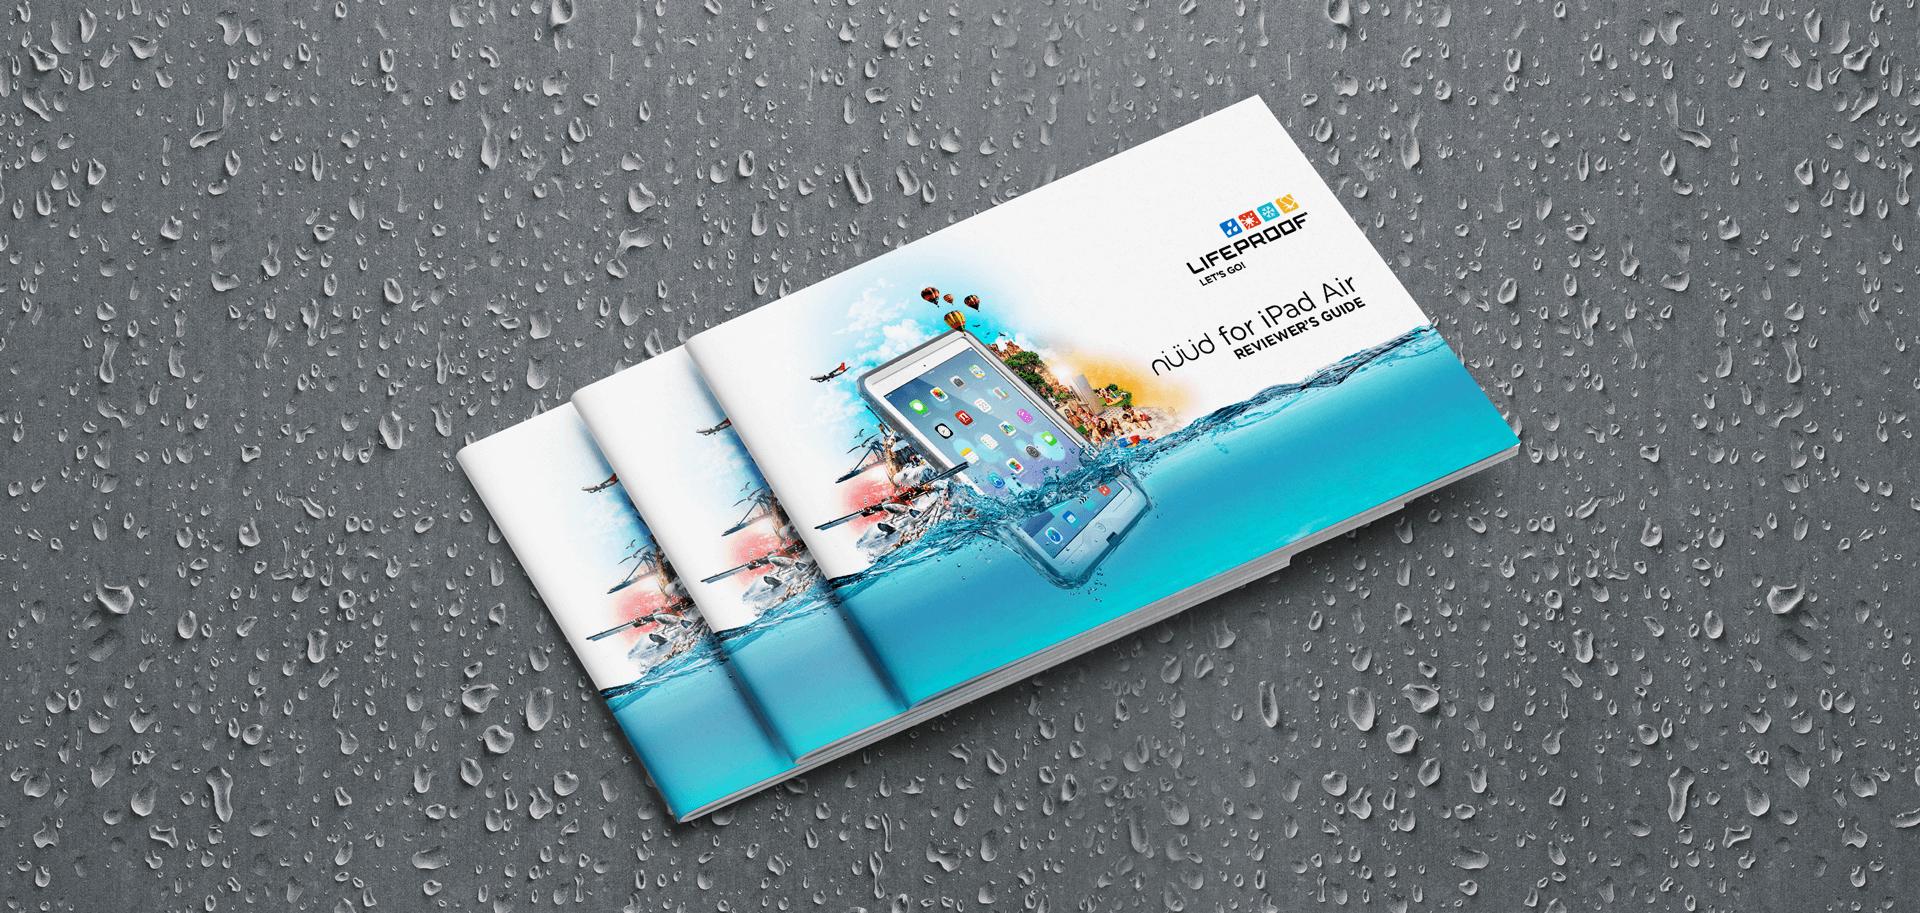 Lifeproof product brochure cover mockup